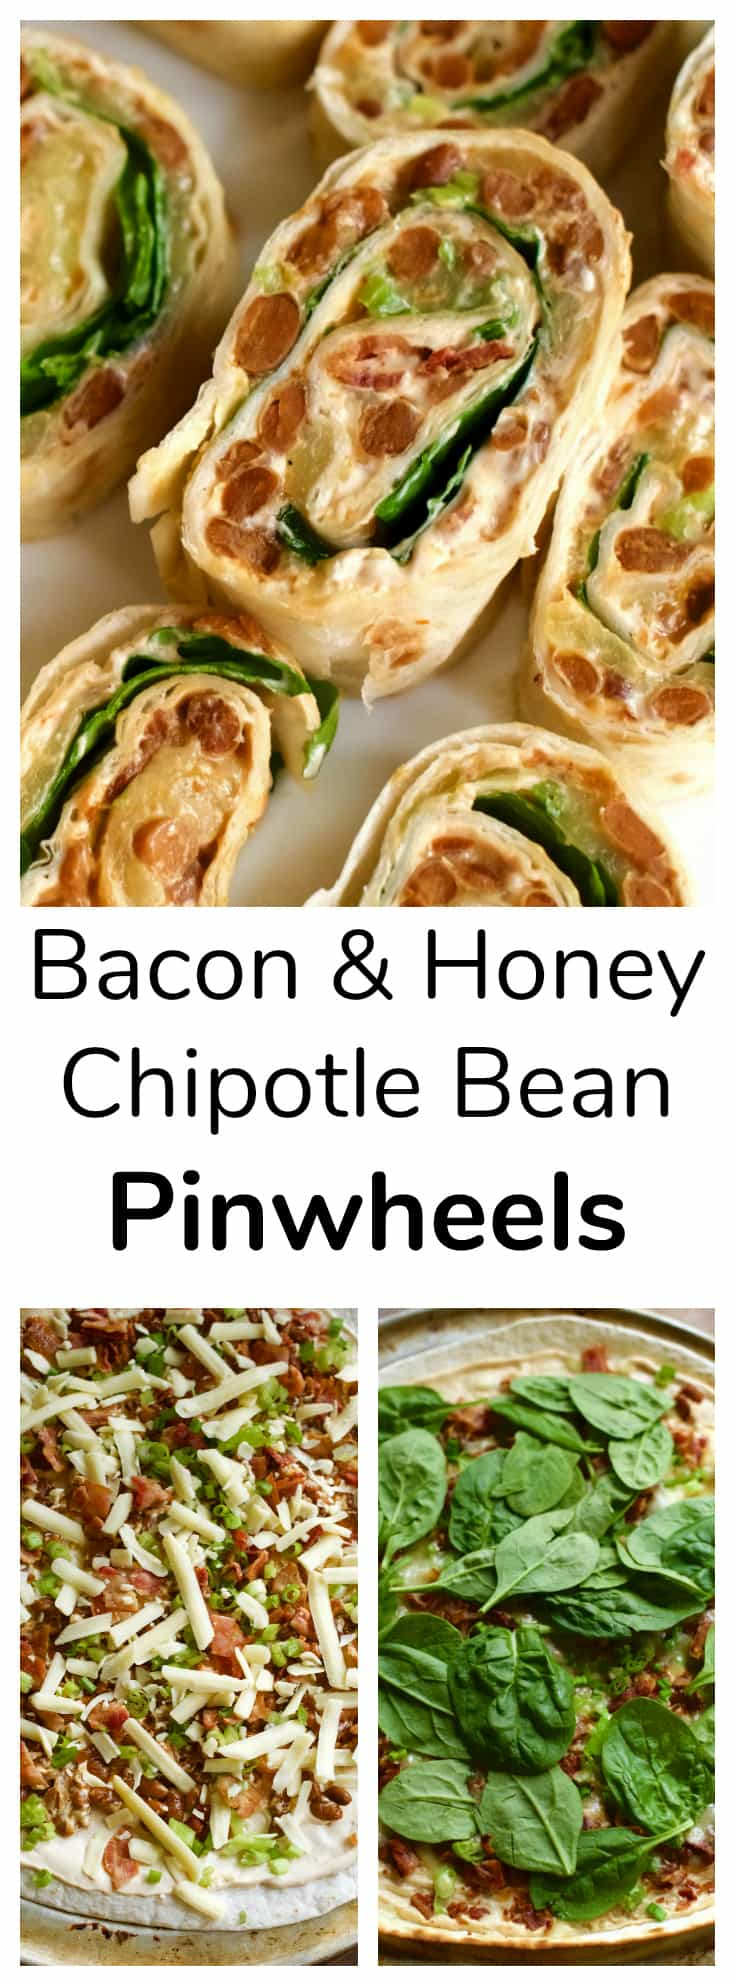 Bacon & Honey Chipotle Bean Pinwheels Recipe in partnership with Bush's Beans